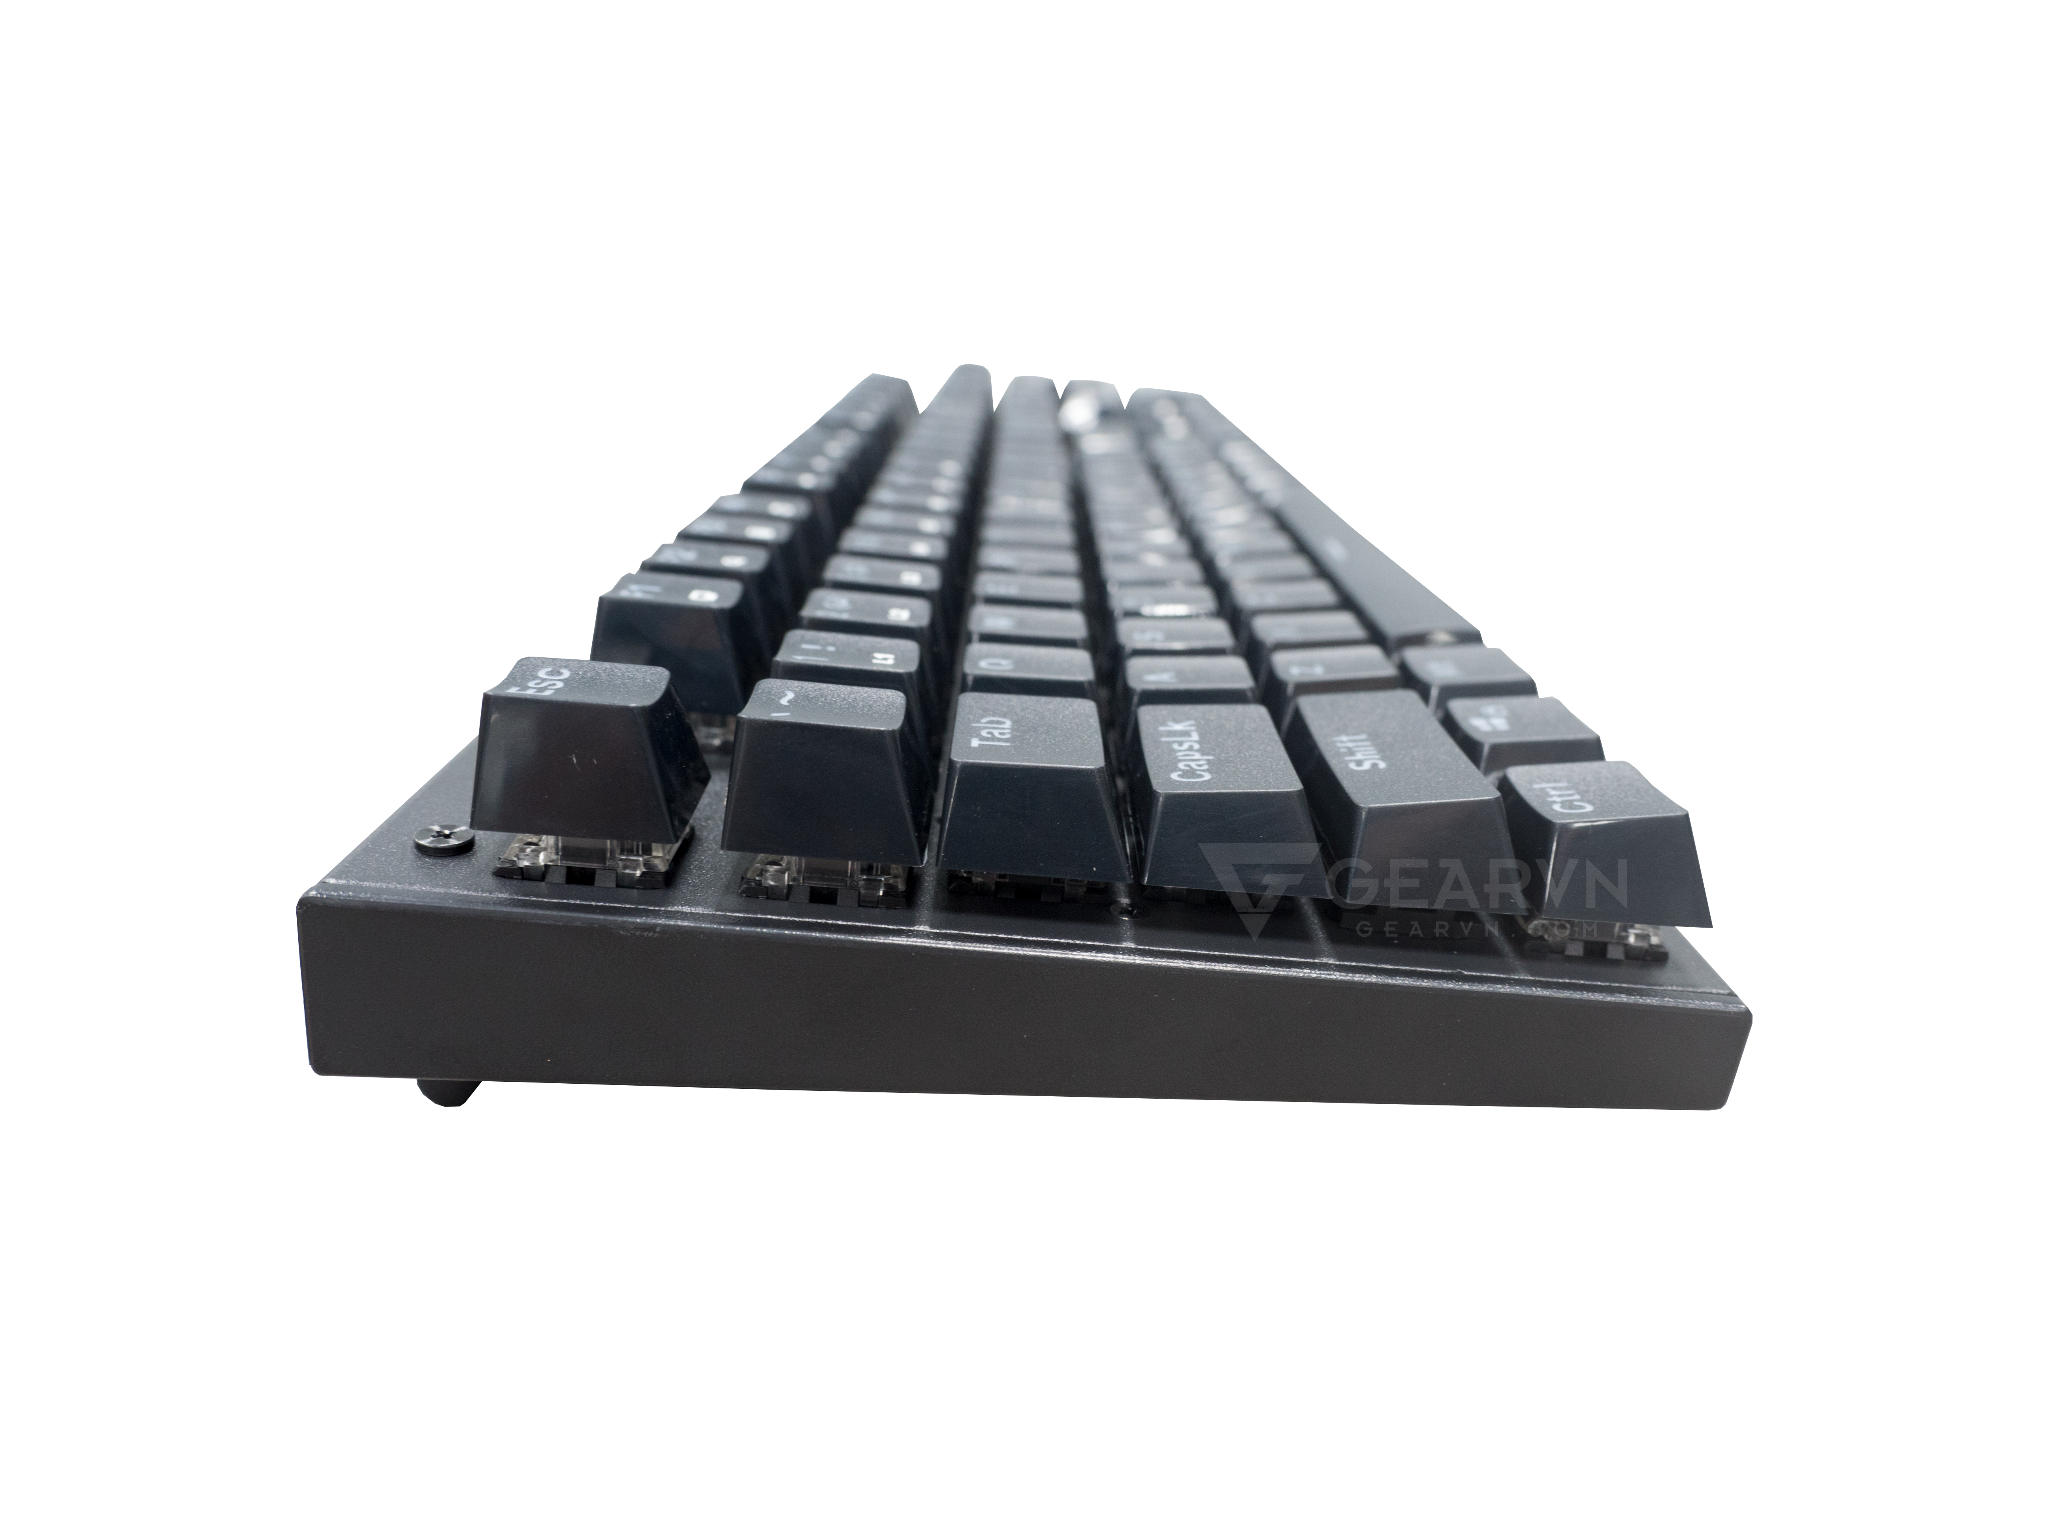 1stPlayer DK3 (Optical Blue Switch)